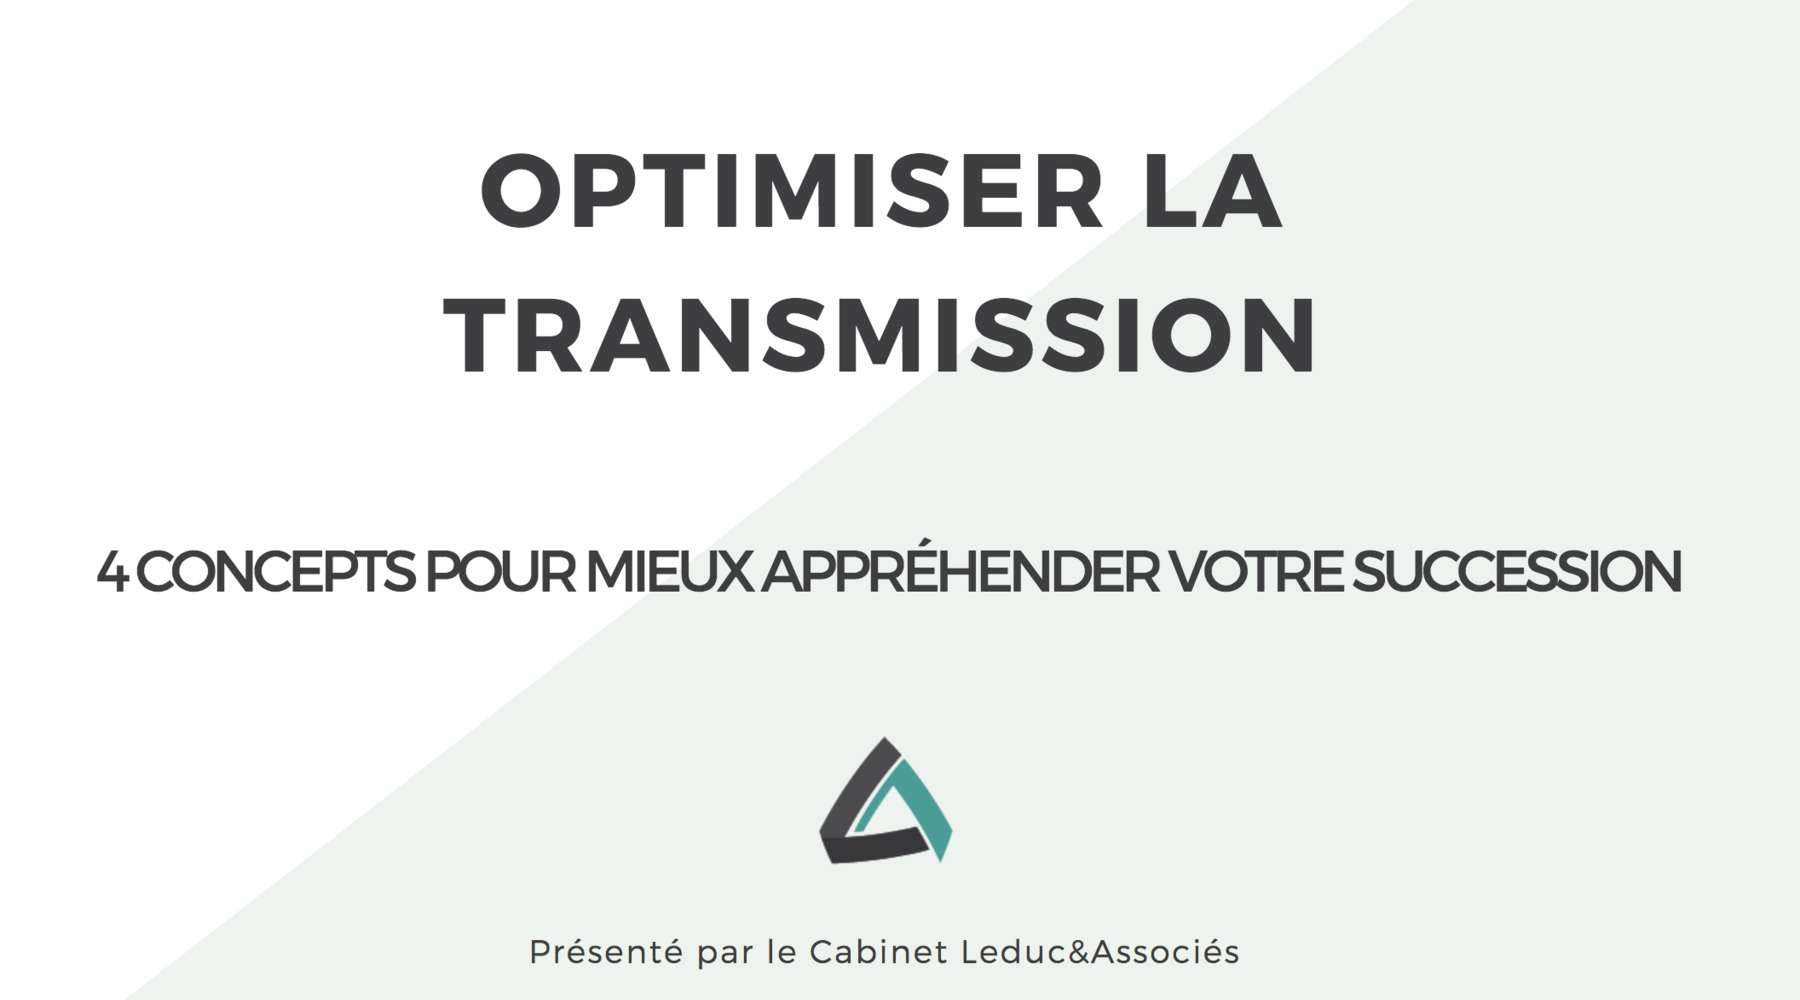 Optimiser la transmission